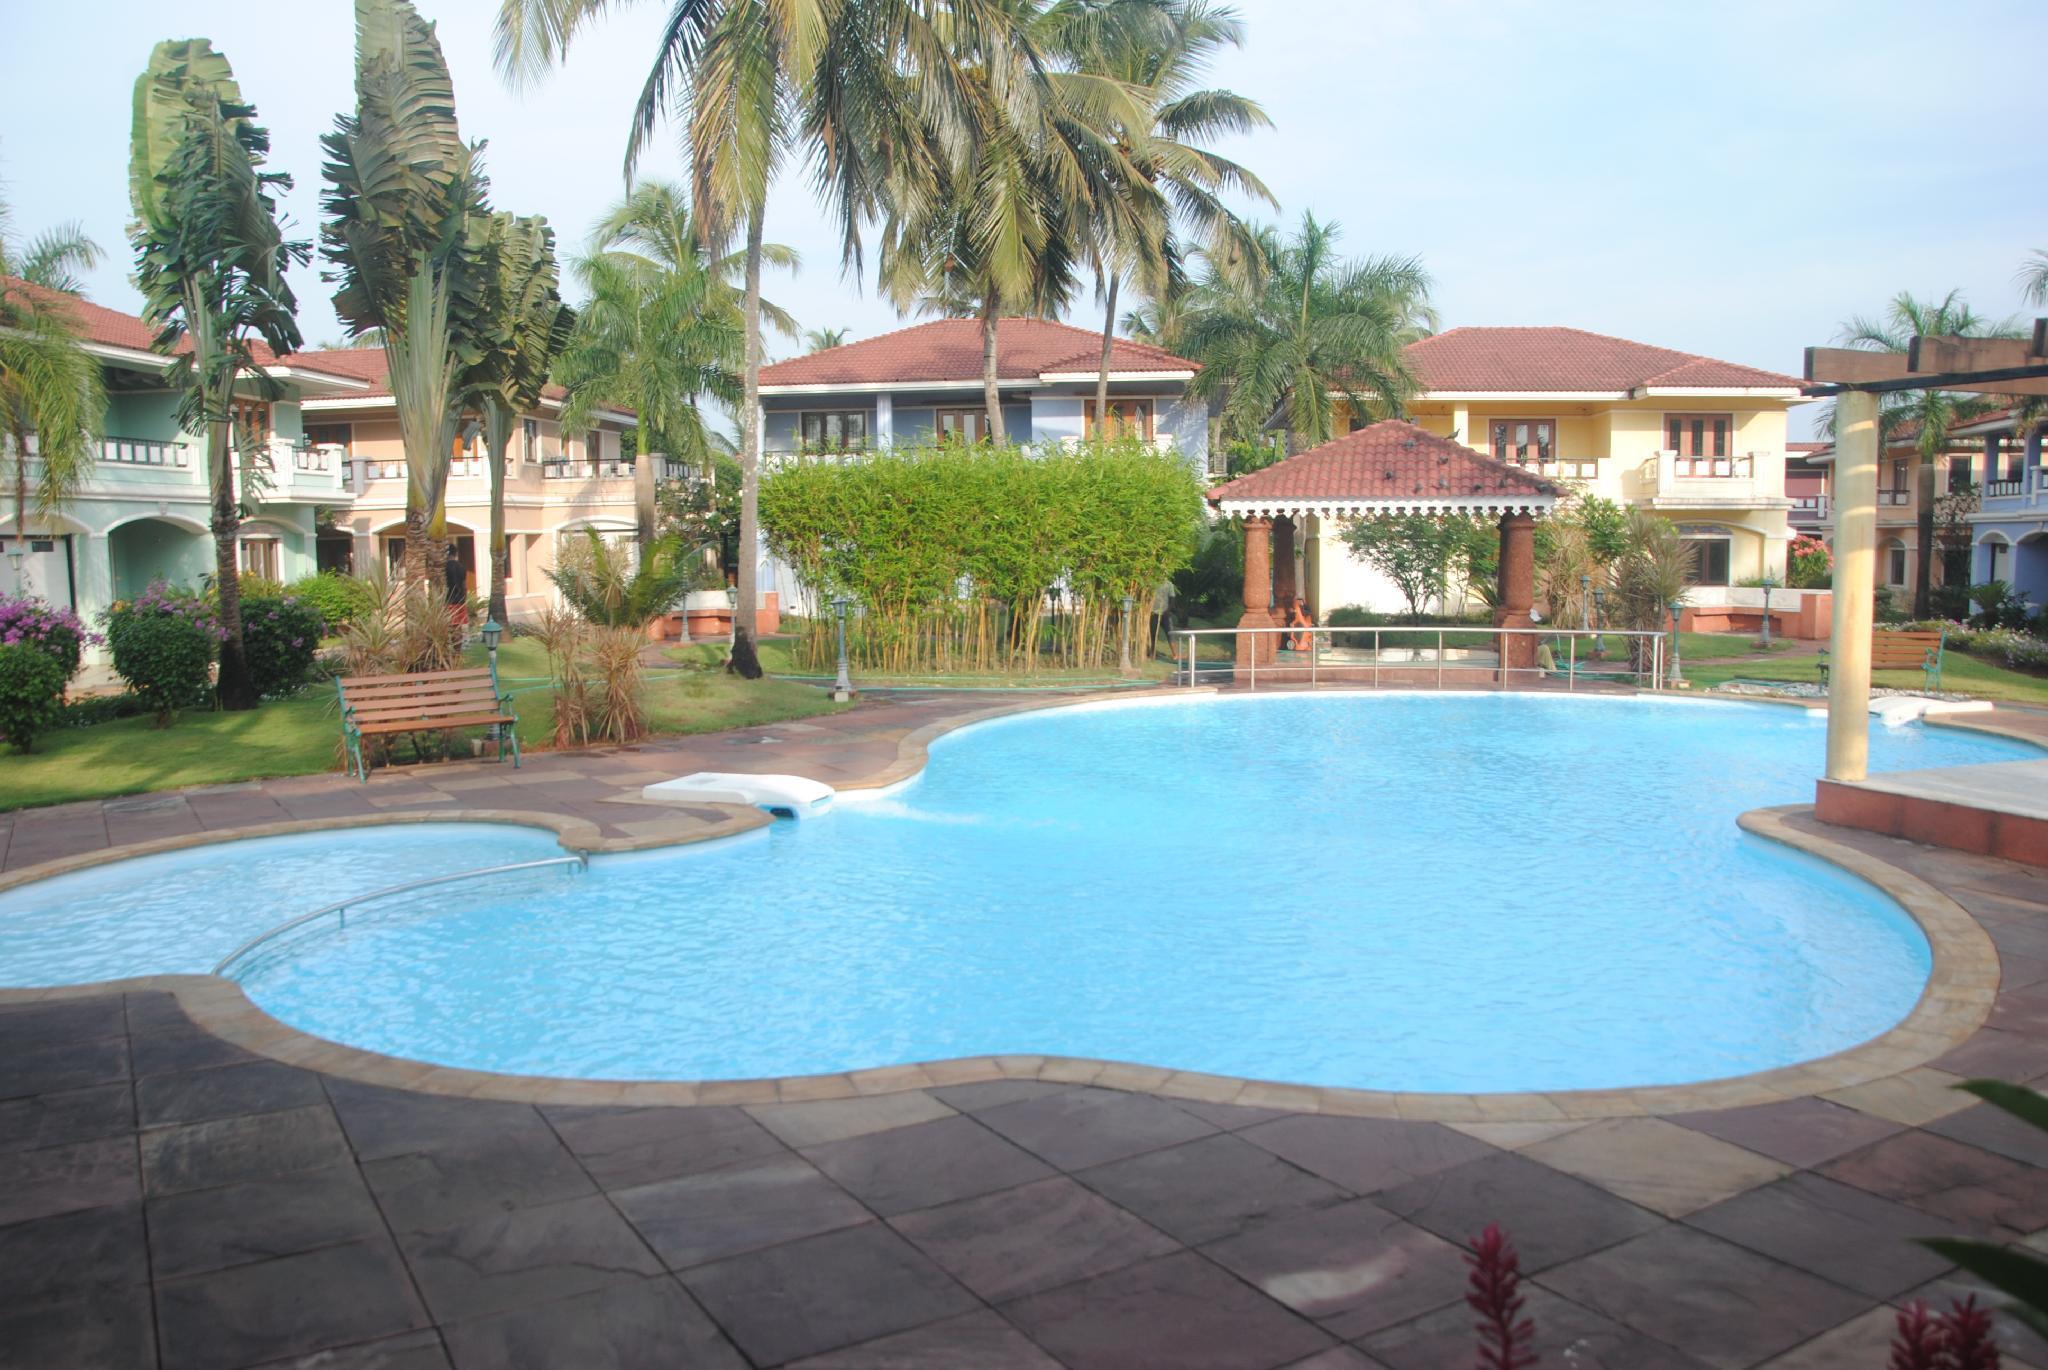 Classy 4 BHK Villa With Pool